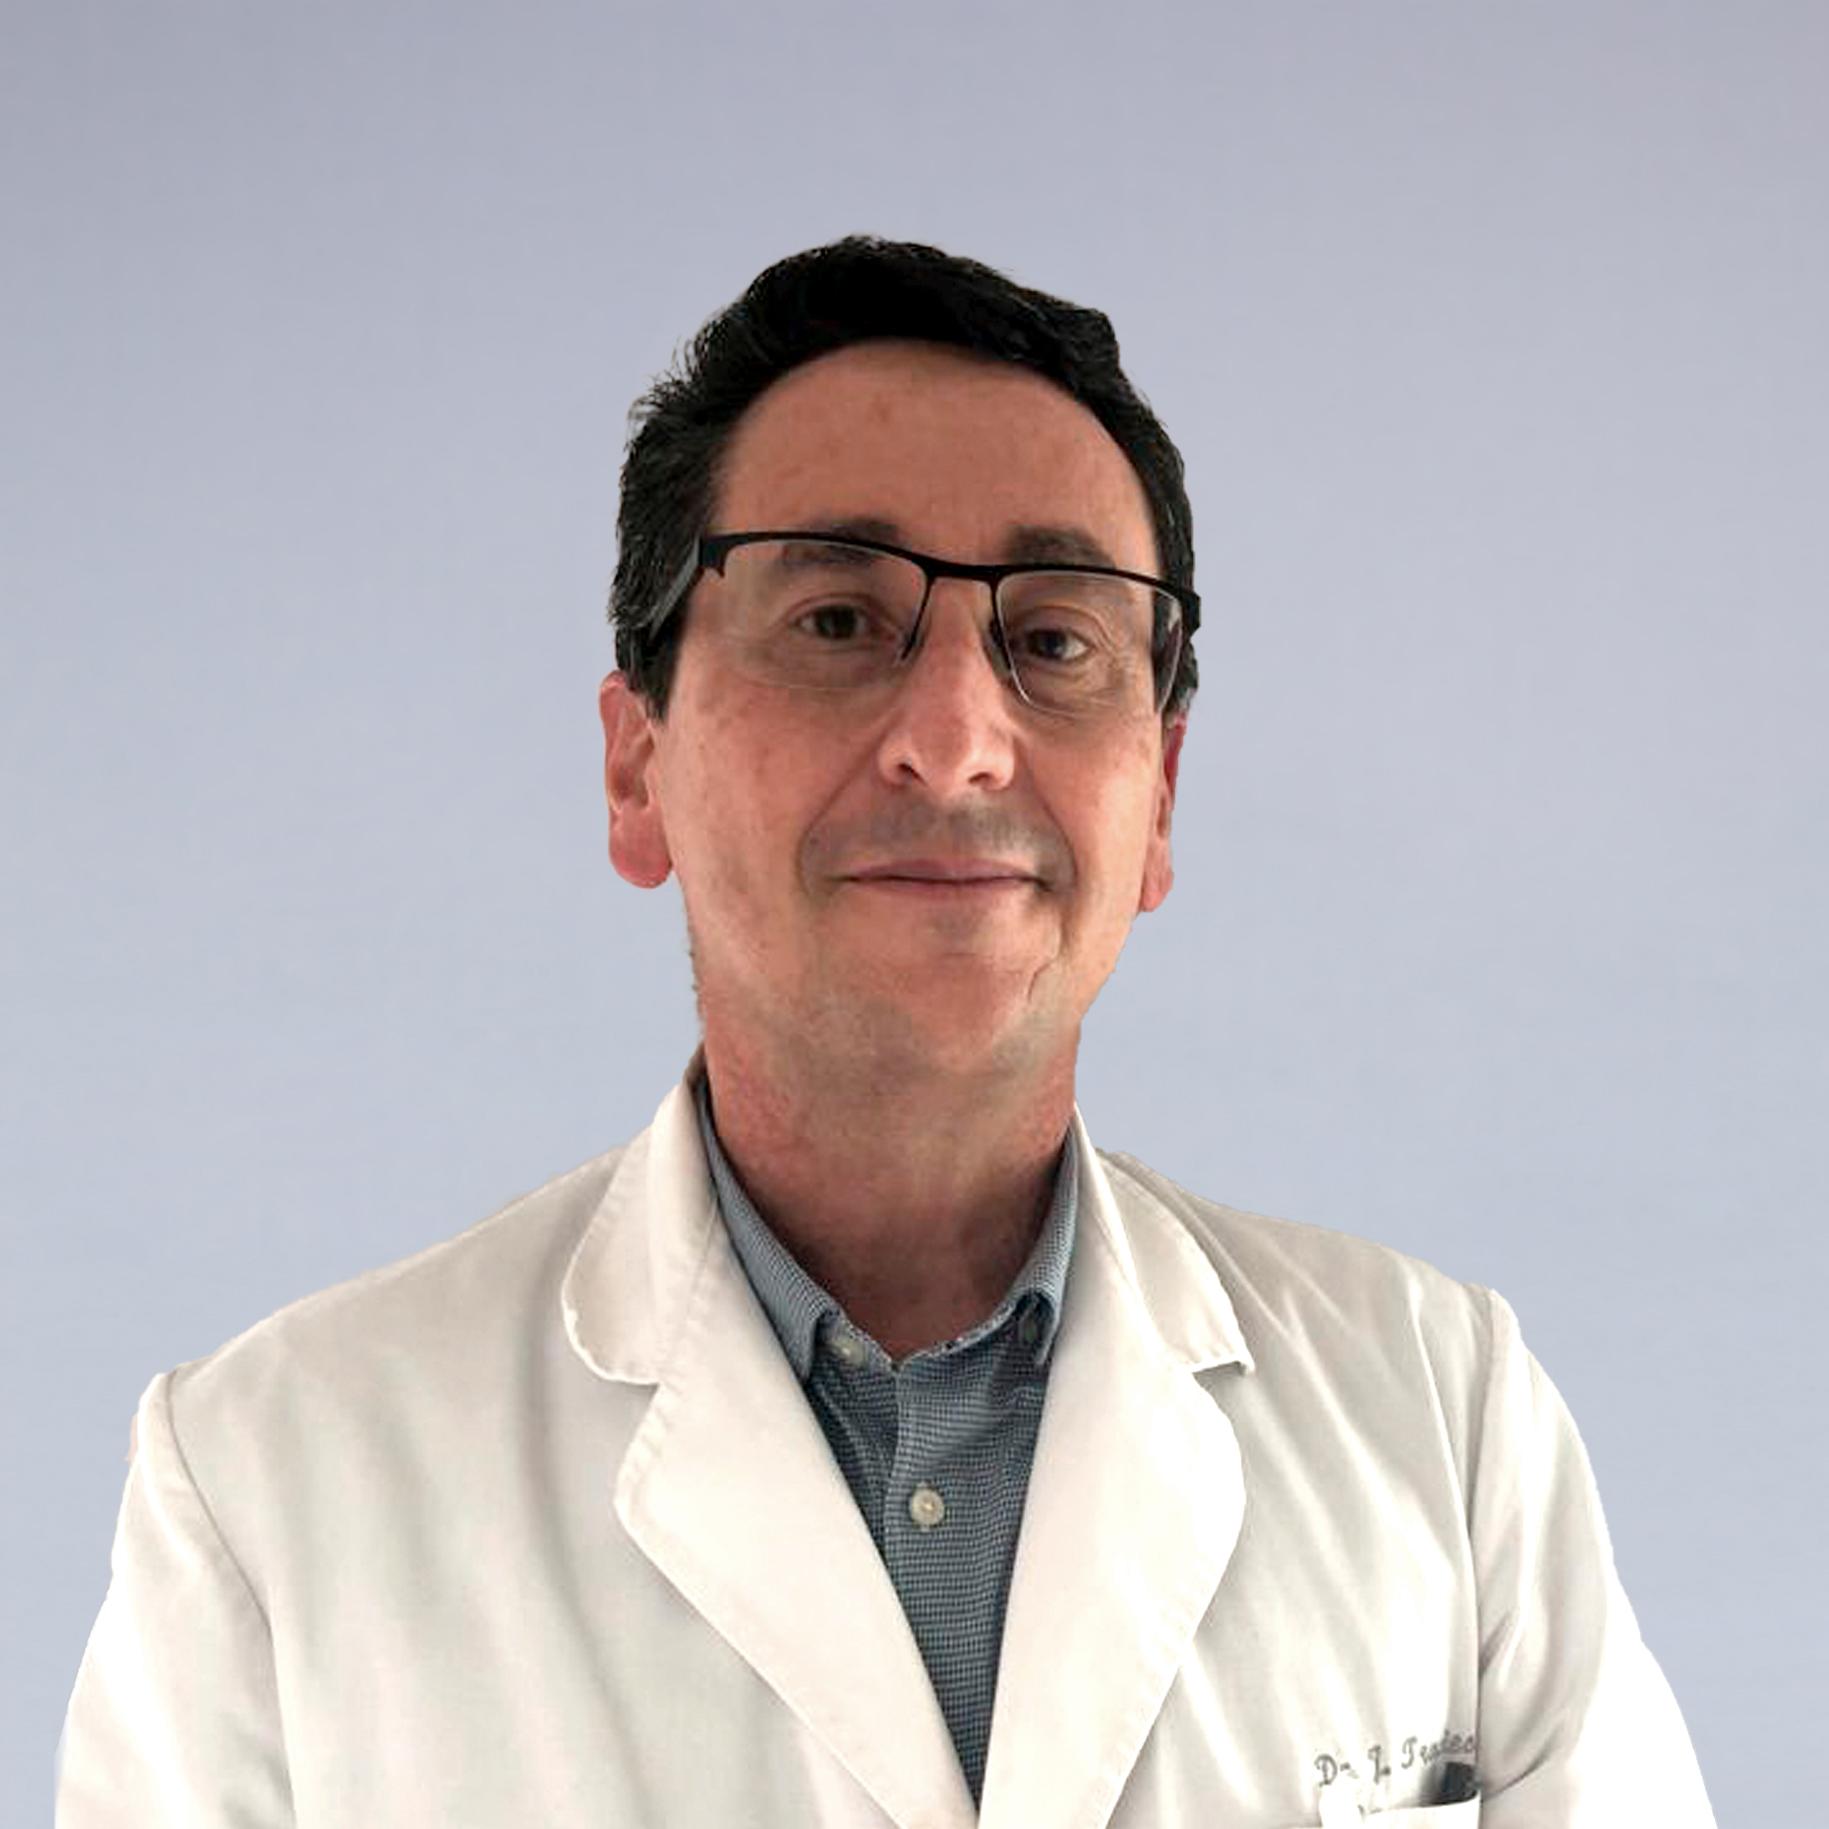 Javier Travieso Betancor